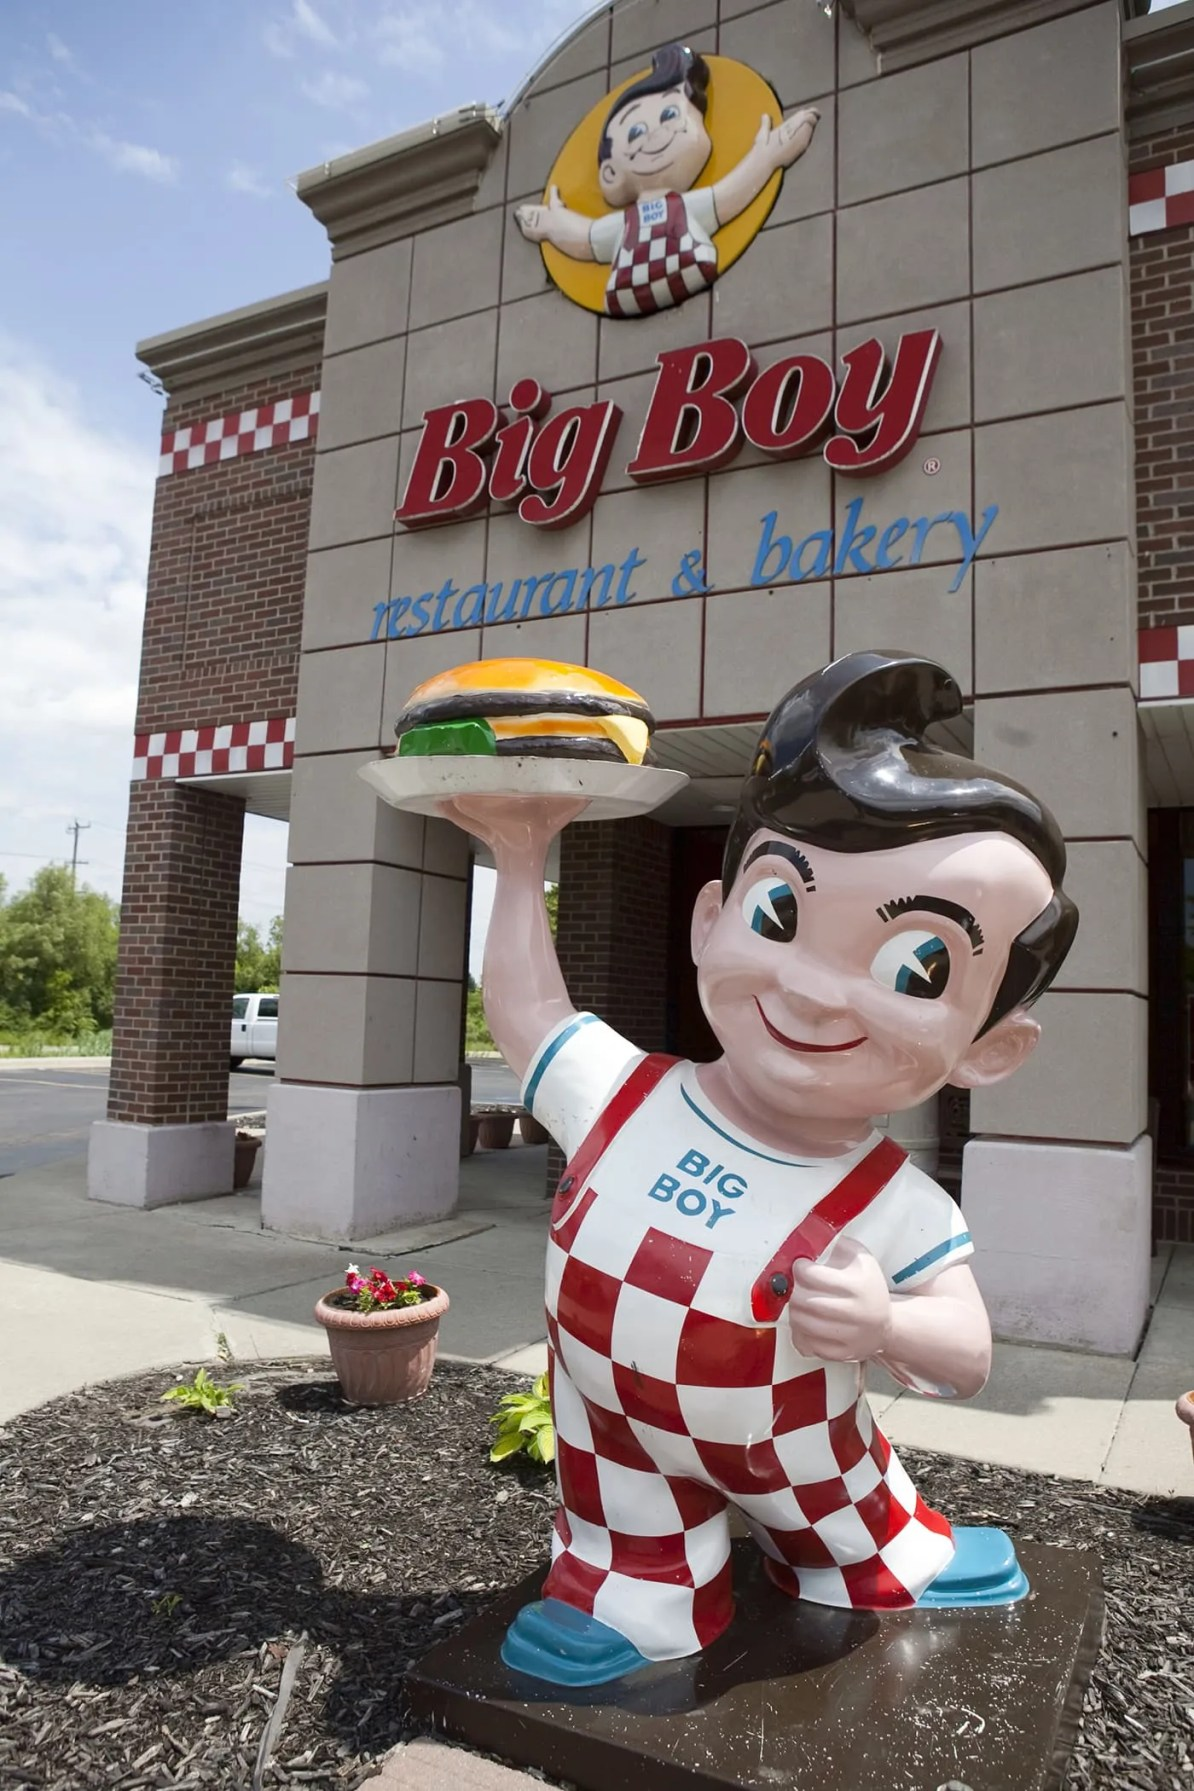 Big Boy Statue - I-94 Exit 175 in Michigan